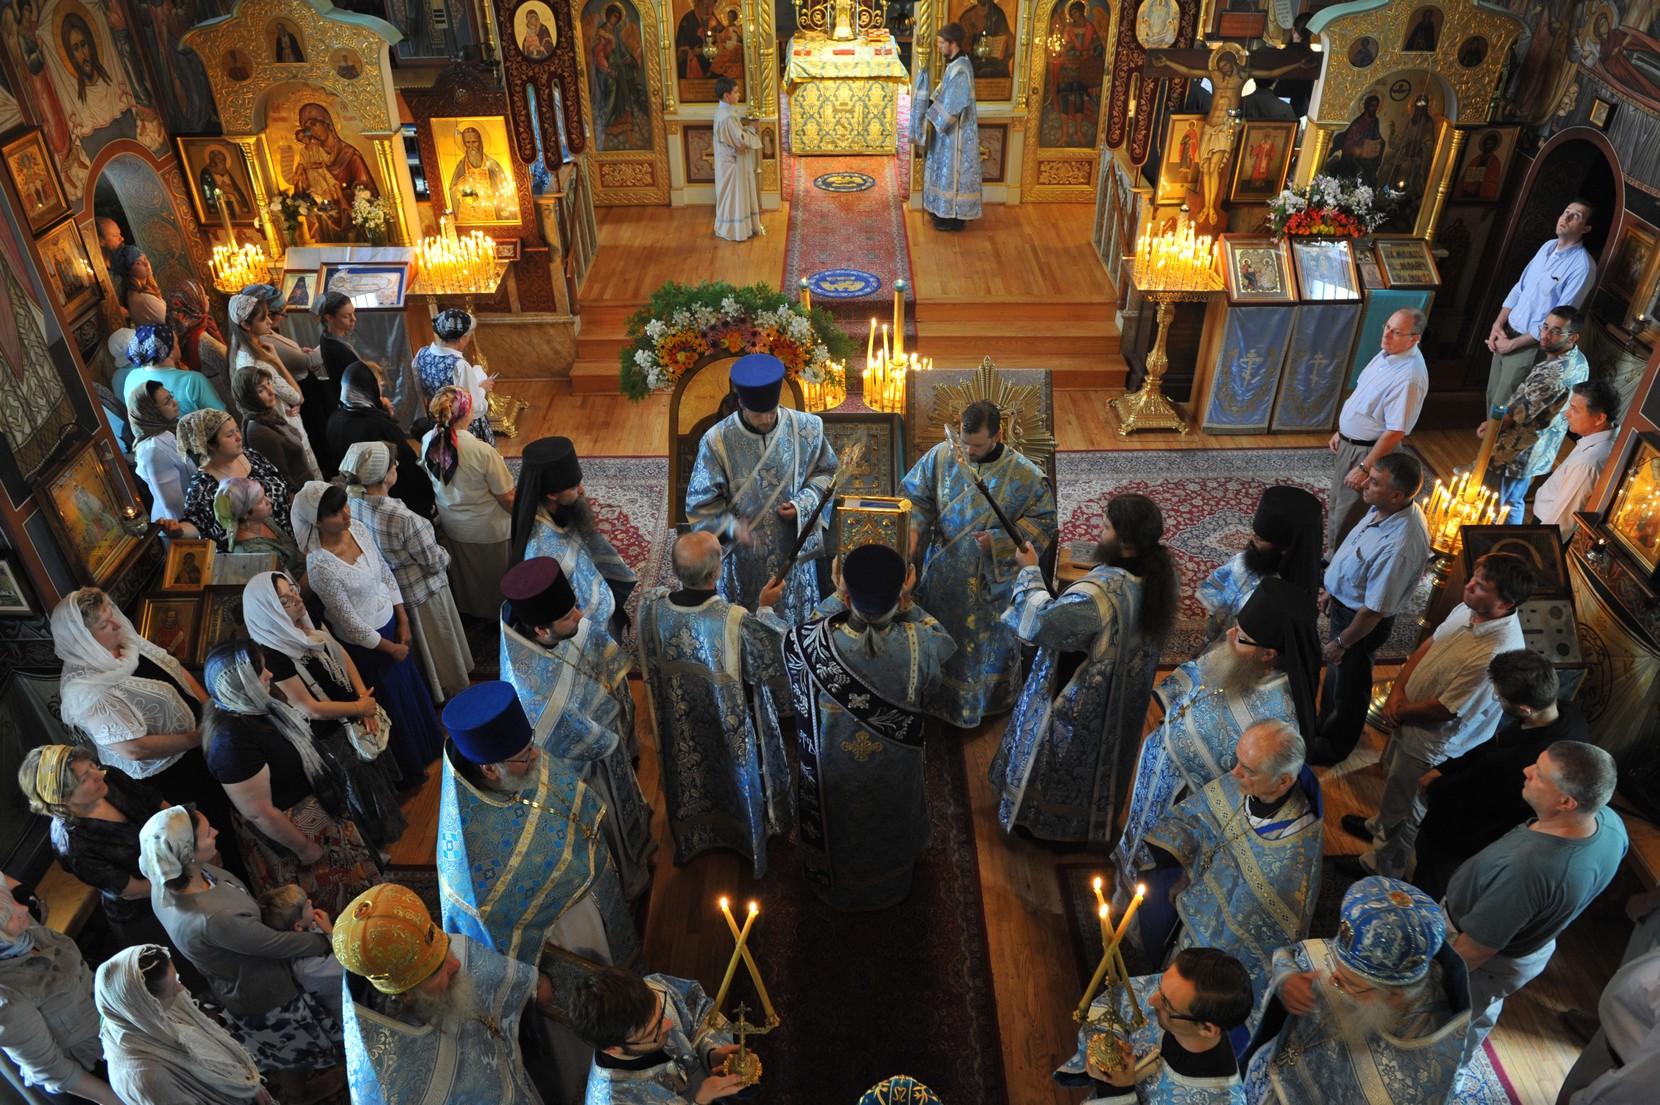 Madre de Dios de Pochaev, Apareció fuente con Agua Sanadora, Rusia (17 abr, 21 sep)